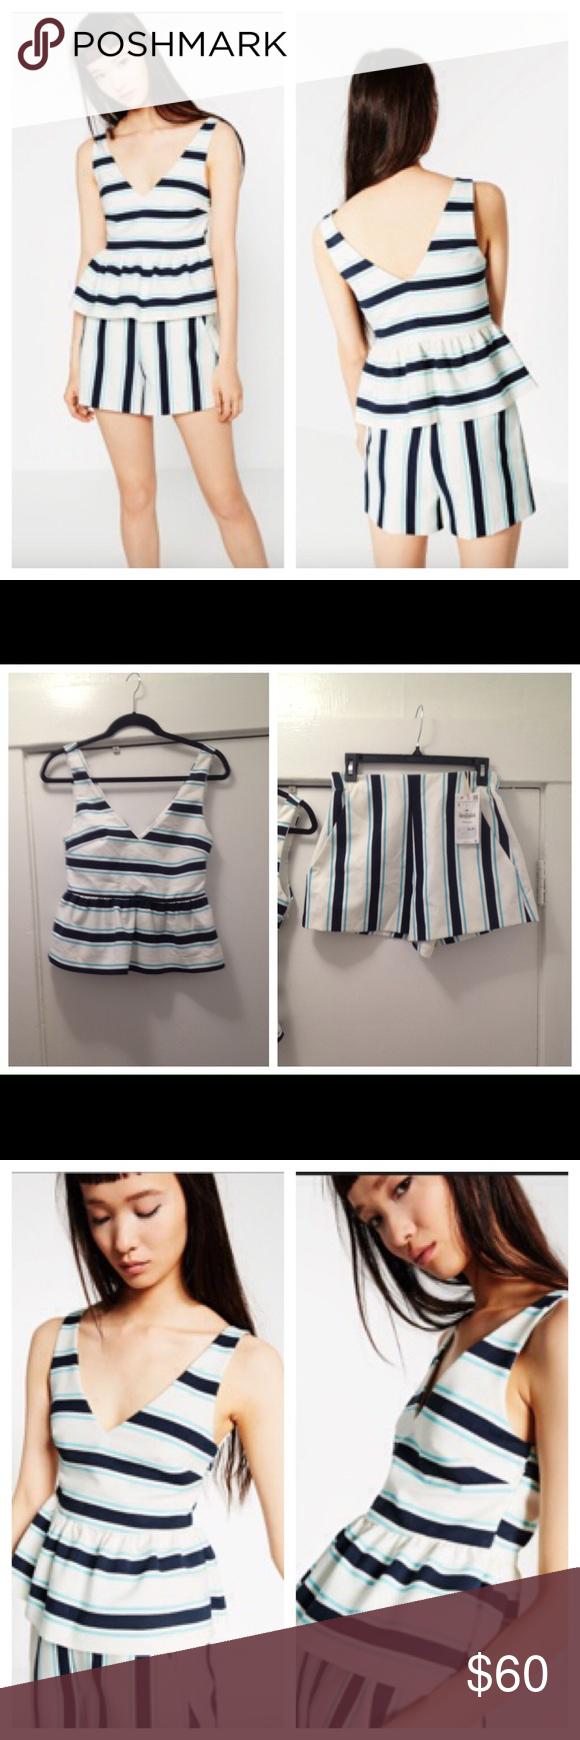 abb372a9fa Zara NWT shorts & tank stripe 2 piece sz SM set Super cute 2 piece Zara